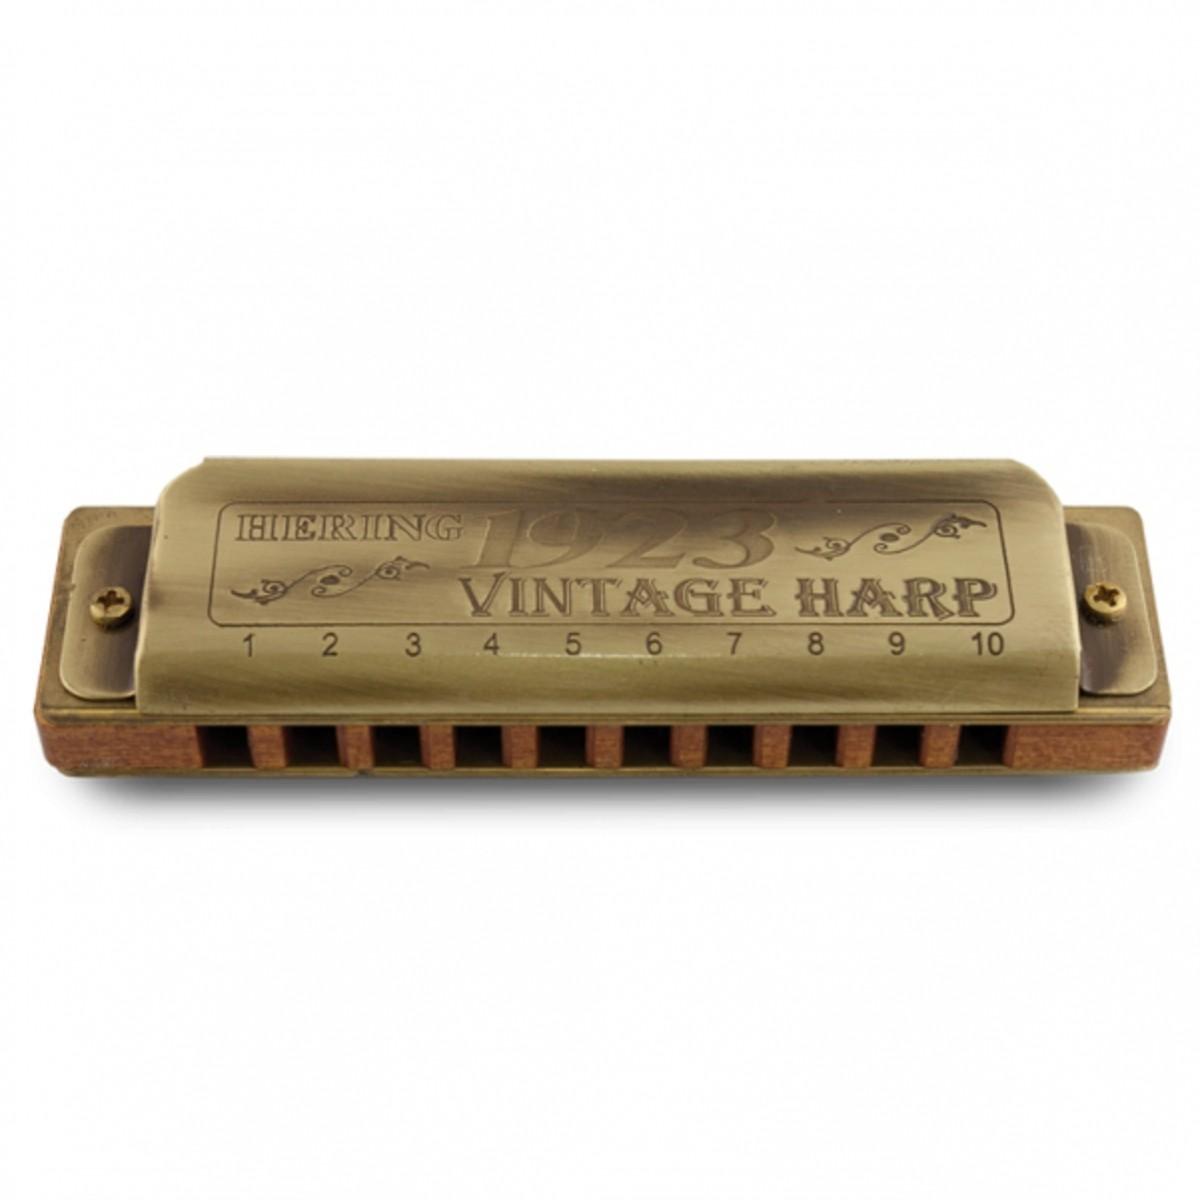 Gaita Vintage Harp C Hering 1020